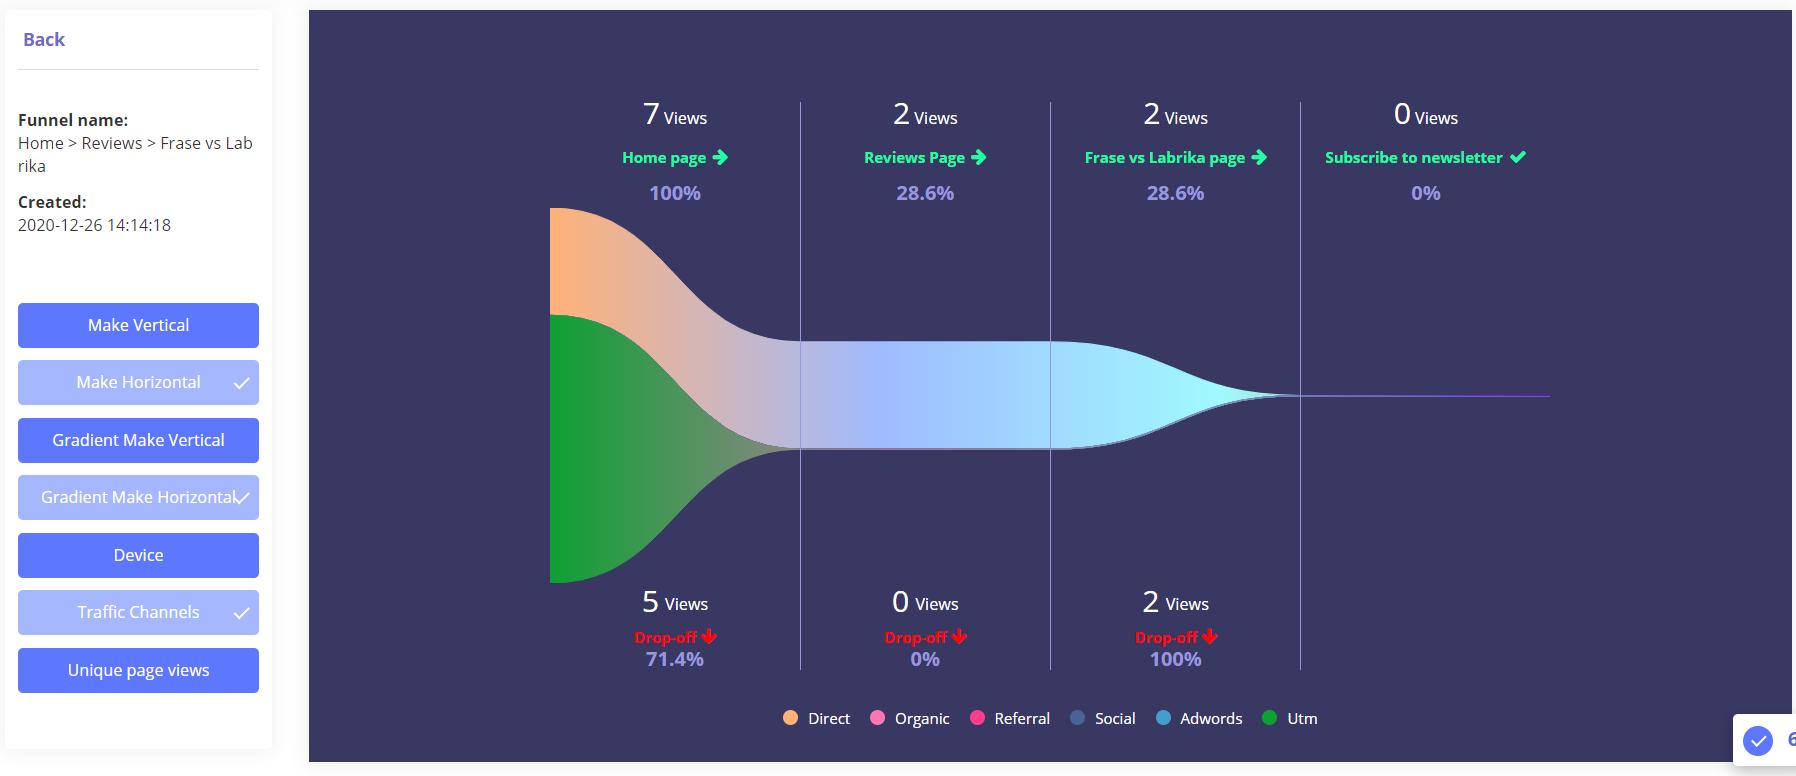 Plerdy conversion funnel analysis screenshot